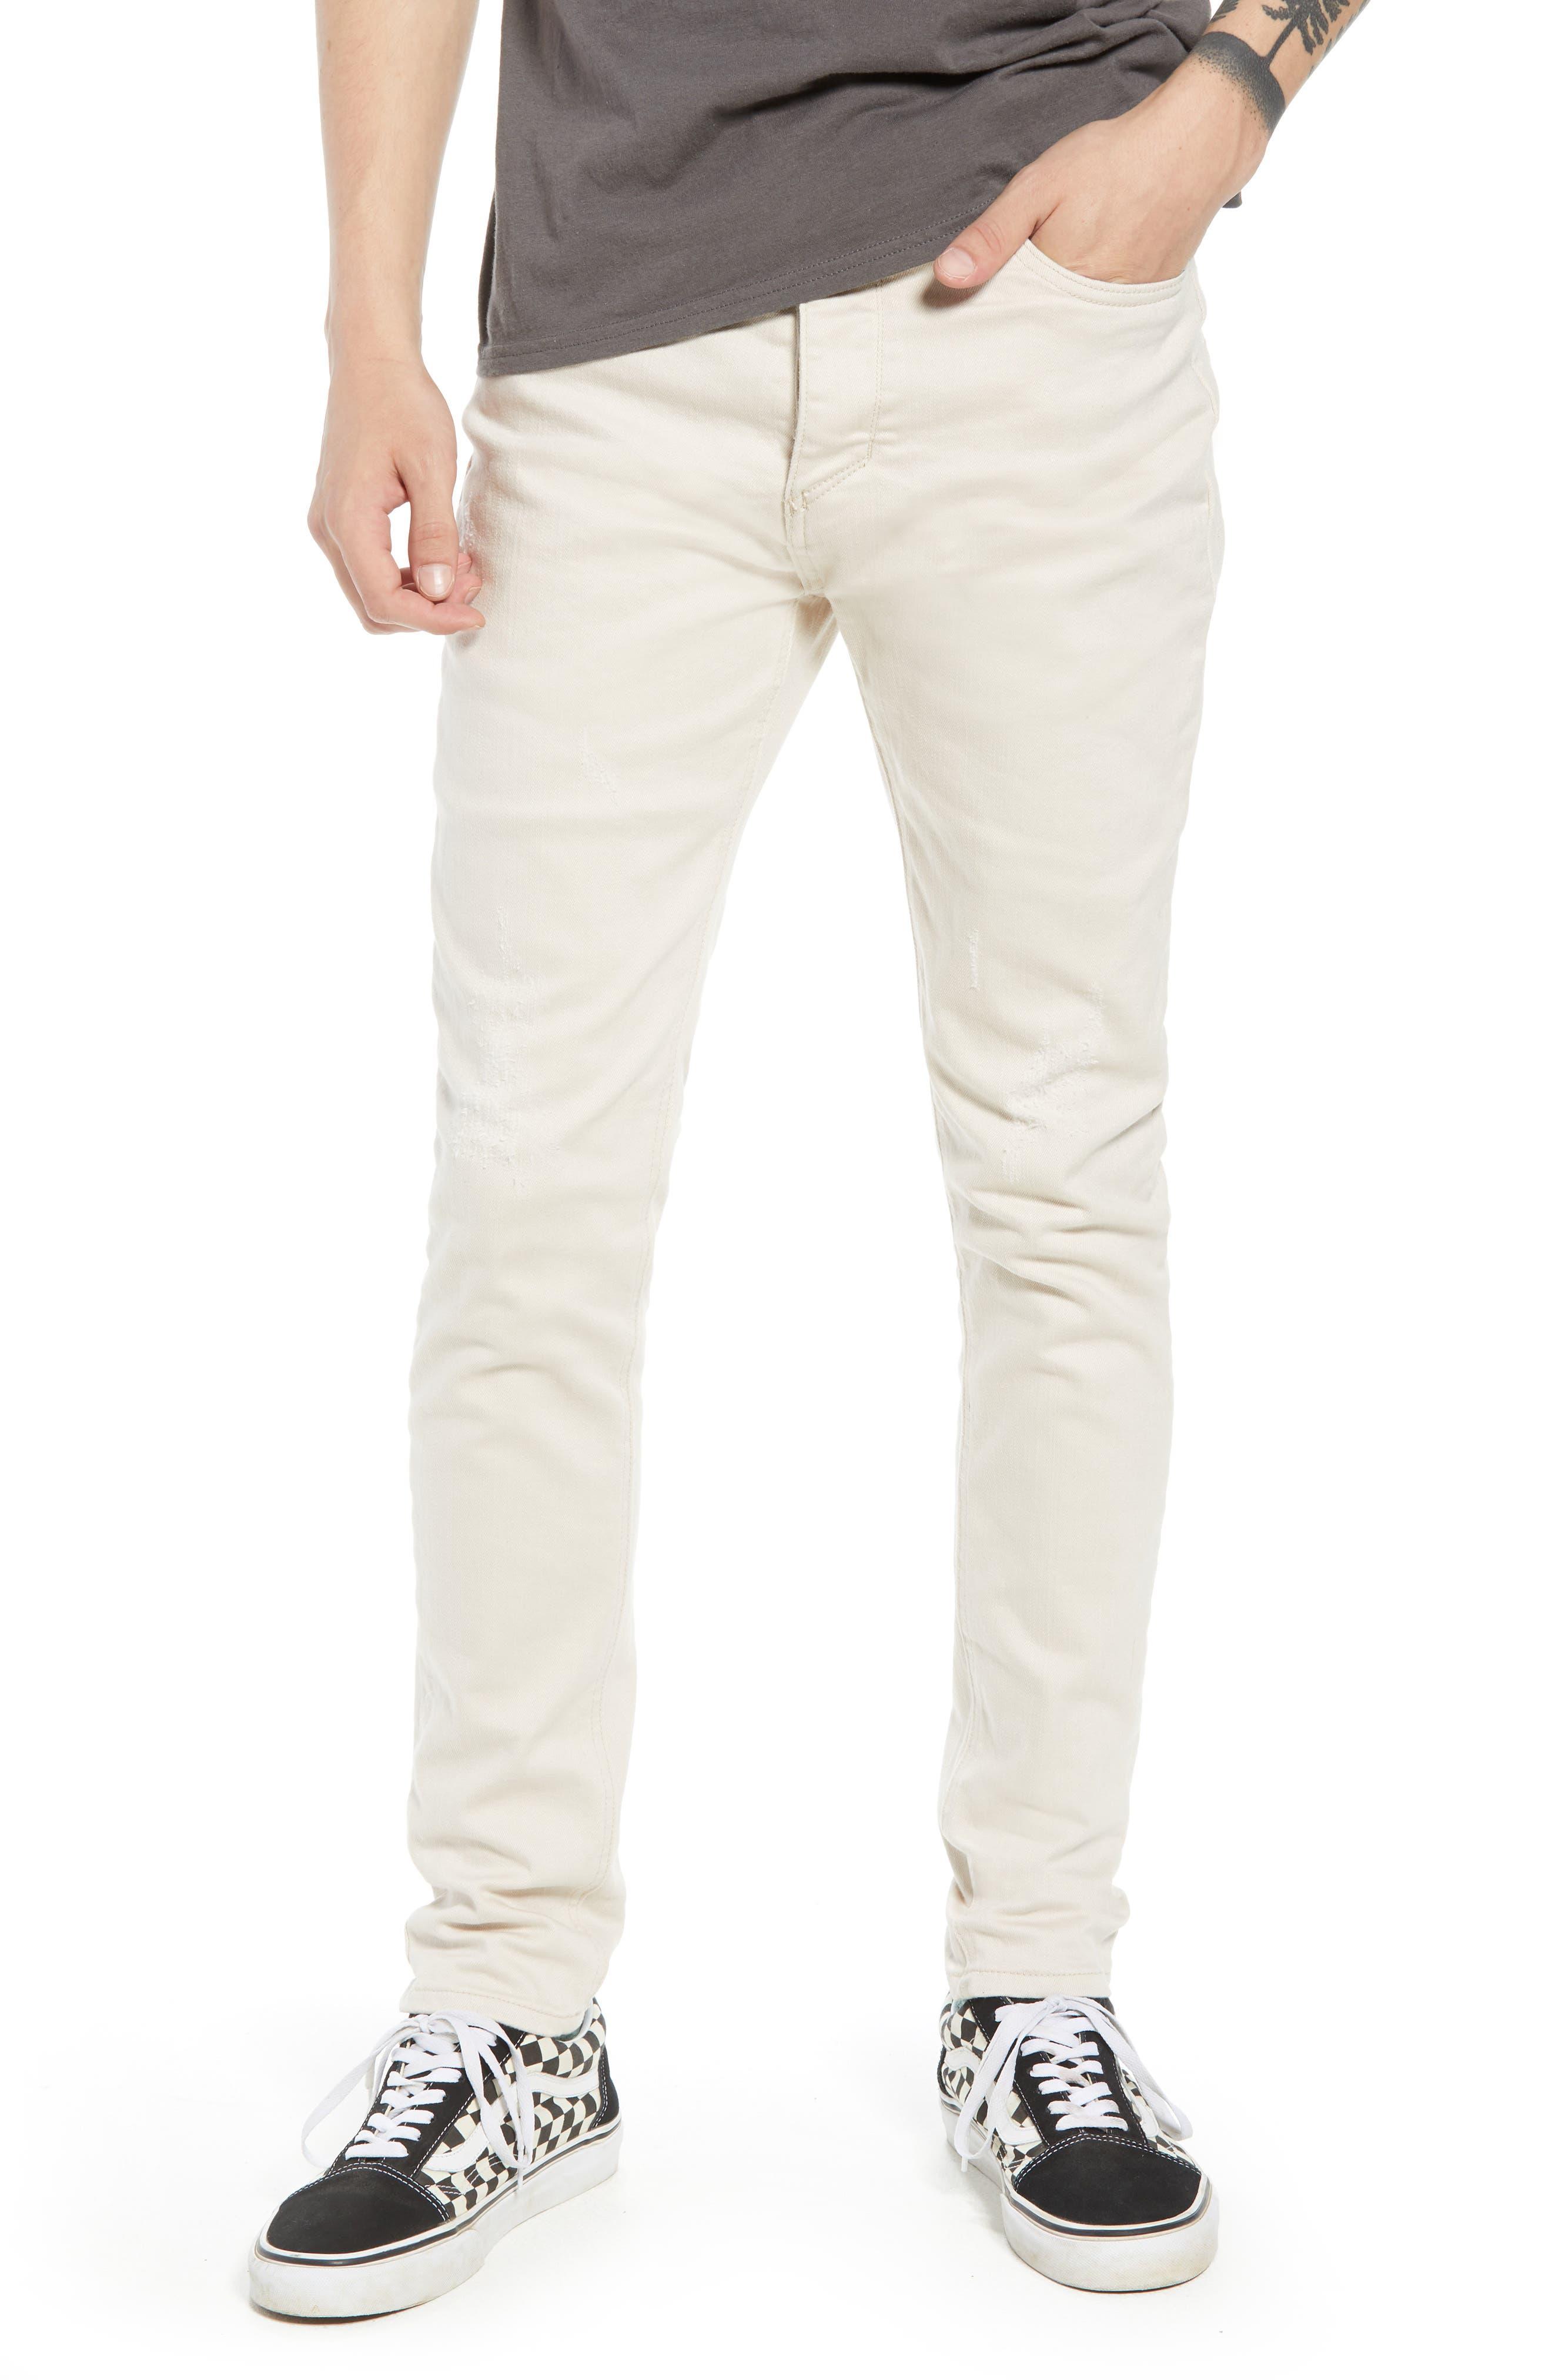 Joe Blow Slim Fit Jeans,                         Main,                         color, 901